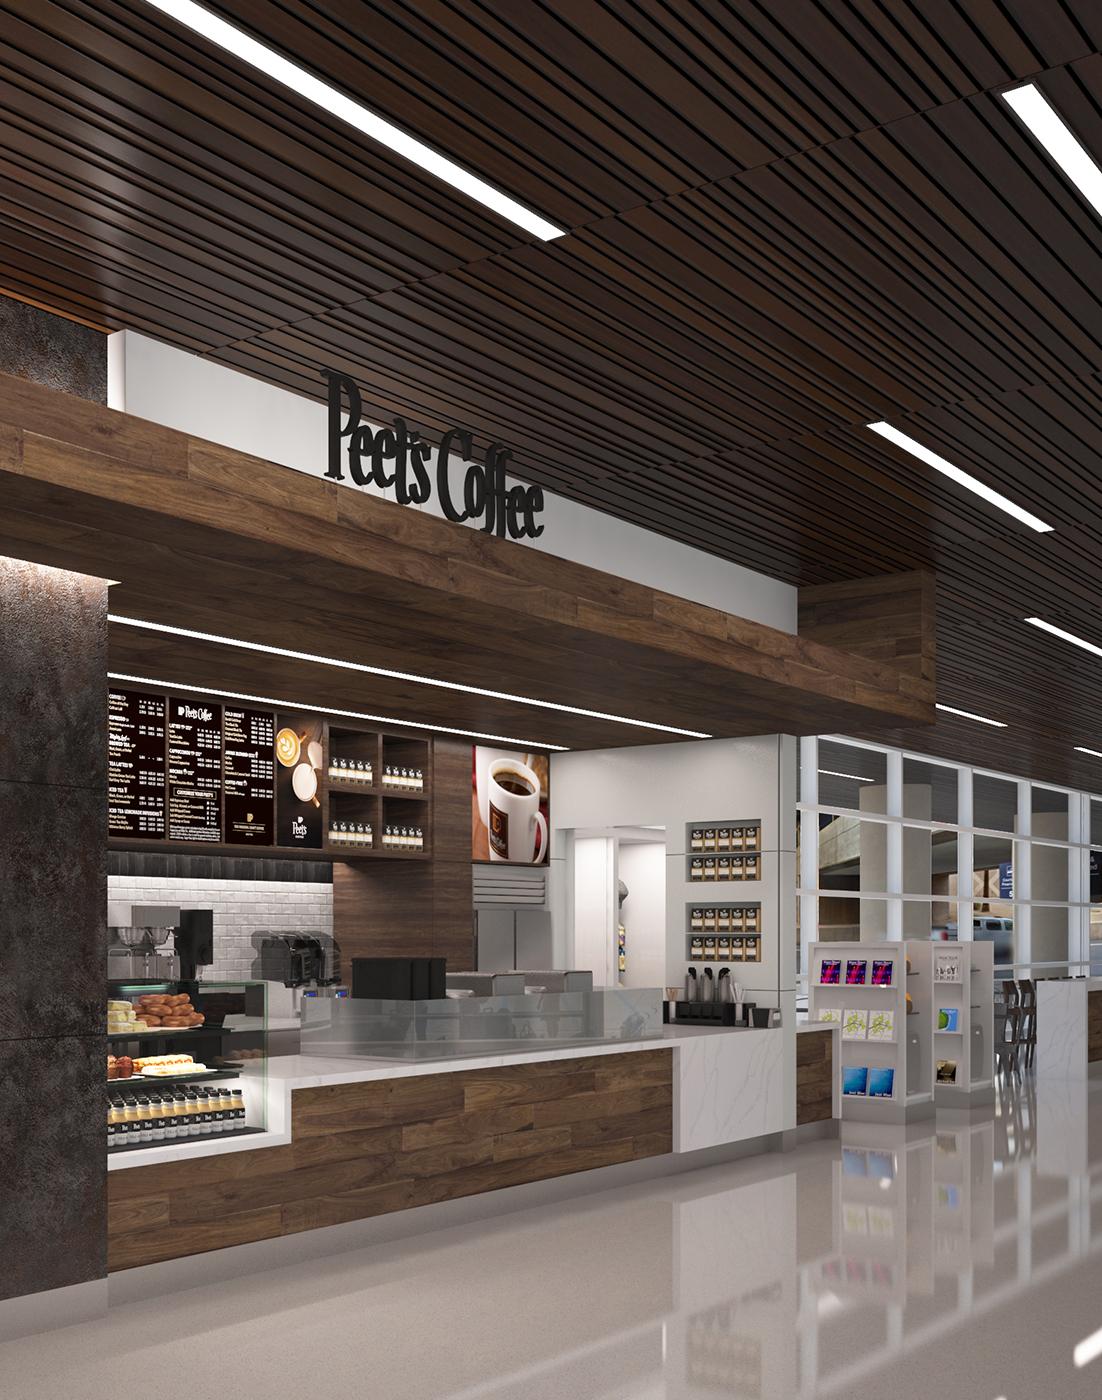 Peet's Coffee - Phoenix Sky Harbor Terminal 3